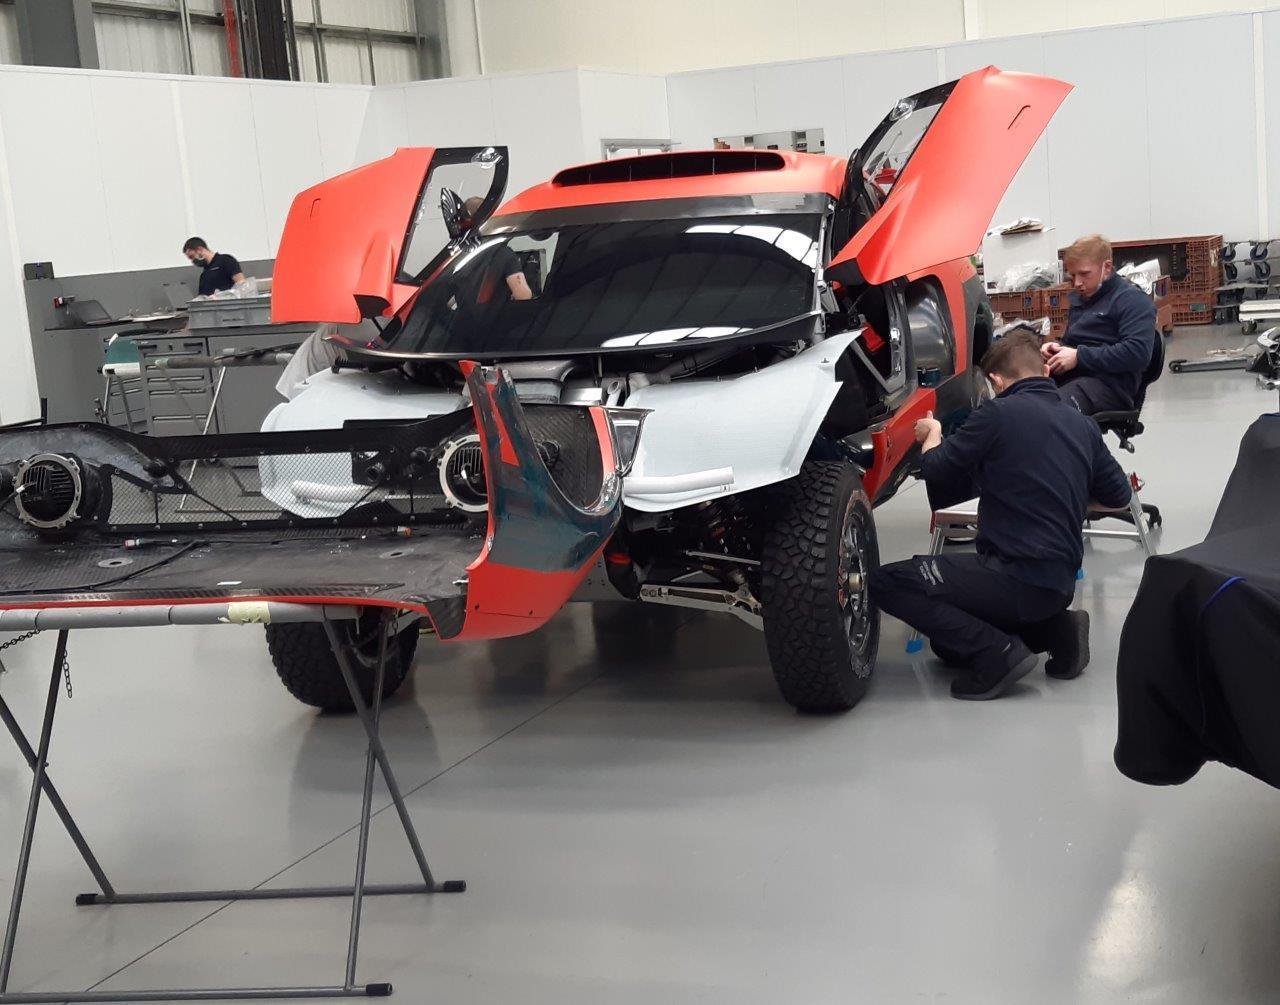 2021 43º Rallye Raid Dakar - Arabia Saudí [3-15 Enero] Bahrain-raid-xtreme-brx-t1-4x4-prodrive-dakar-1